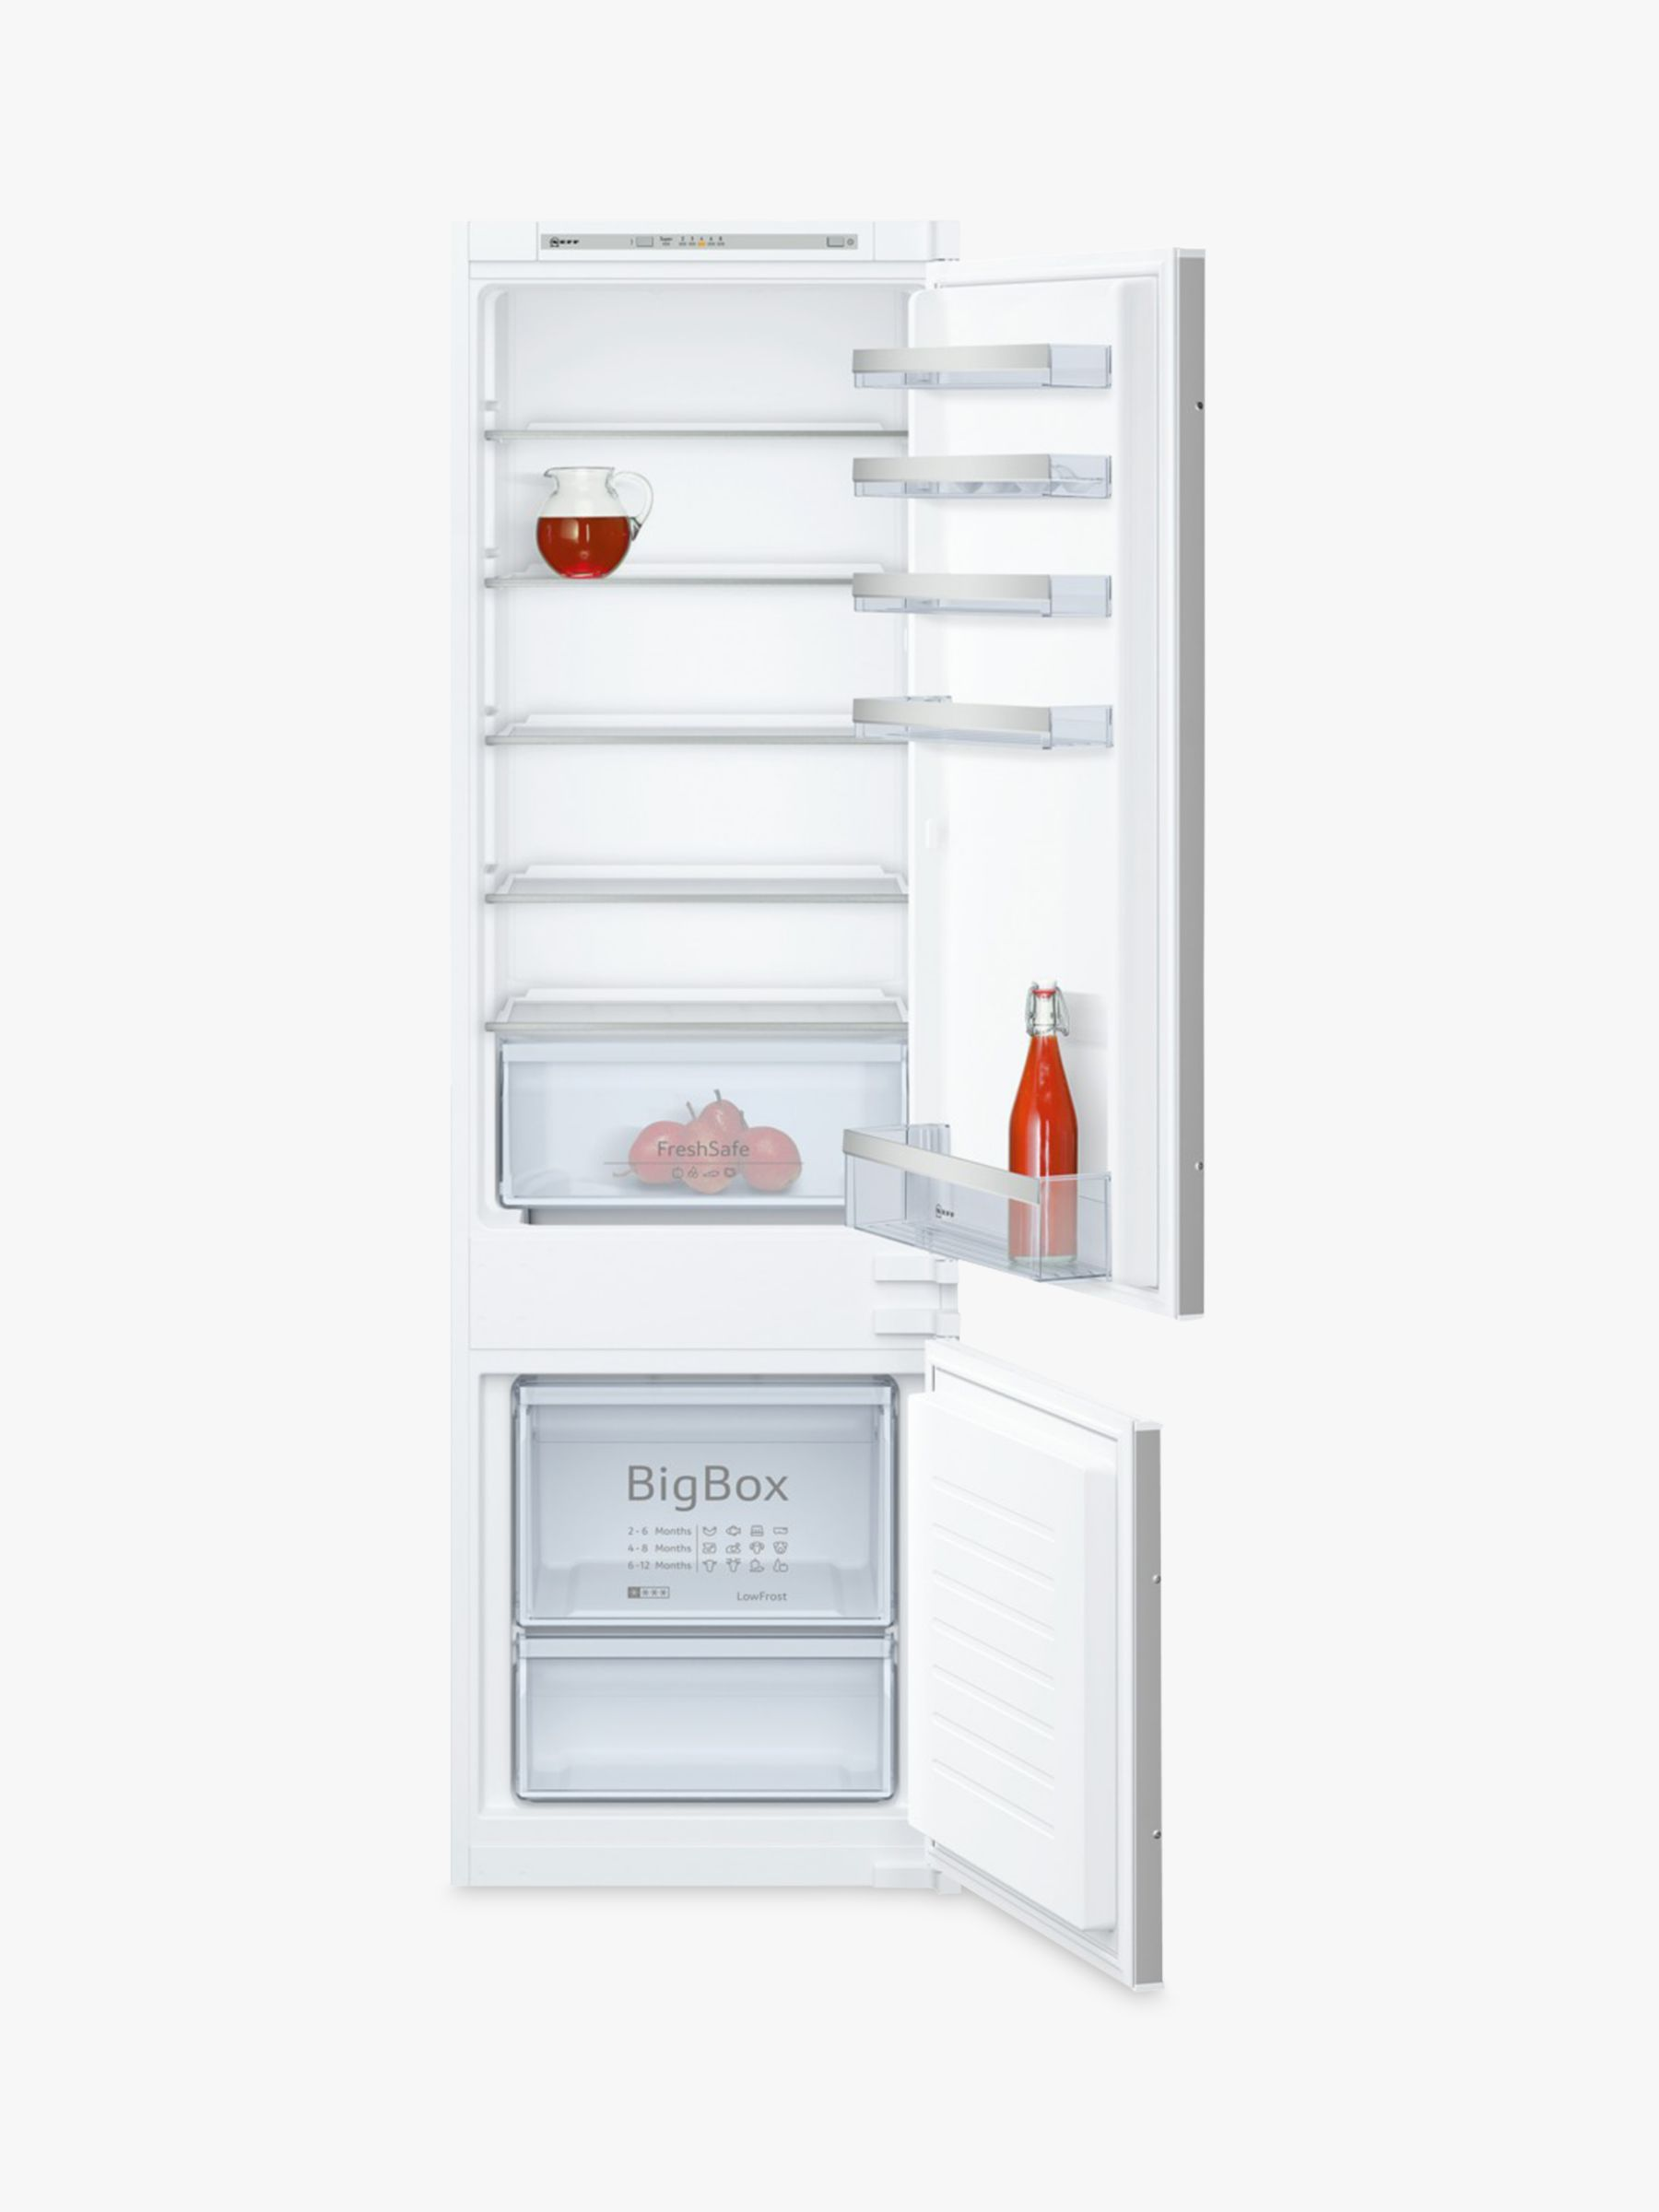 NEFF Neff KI5872S30G Integrated Fridge Freezer, A++ Energy Rating, 55cm Wide